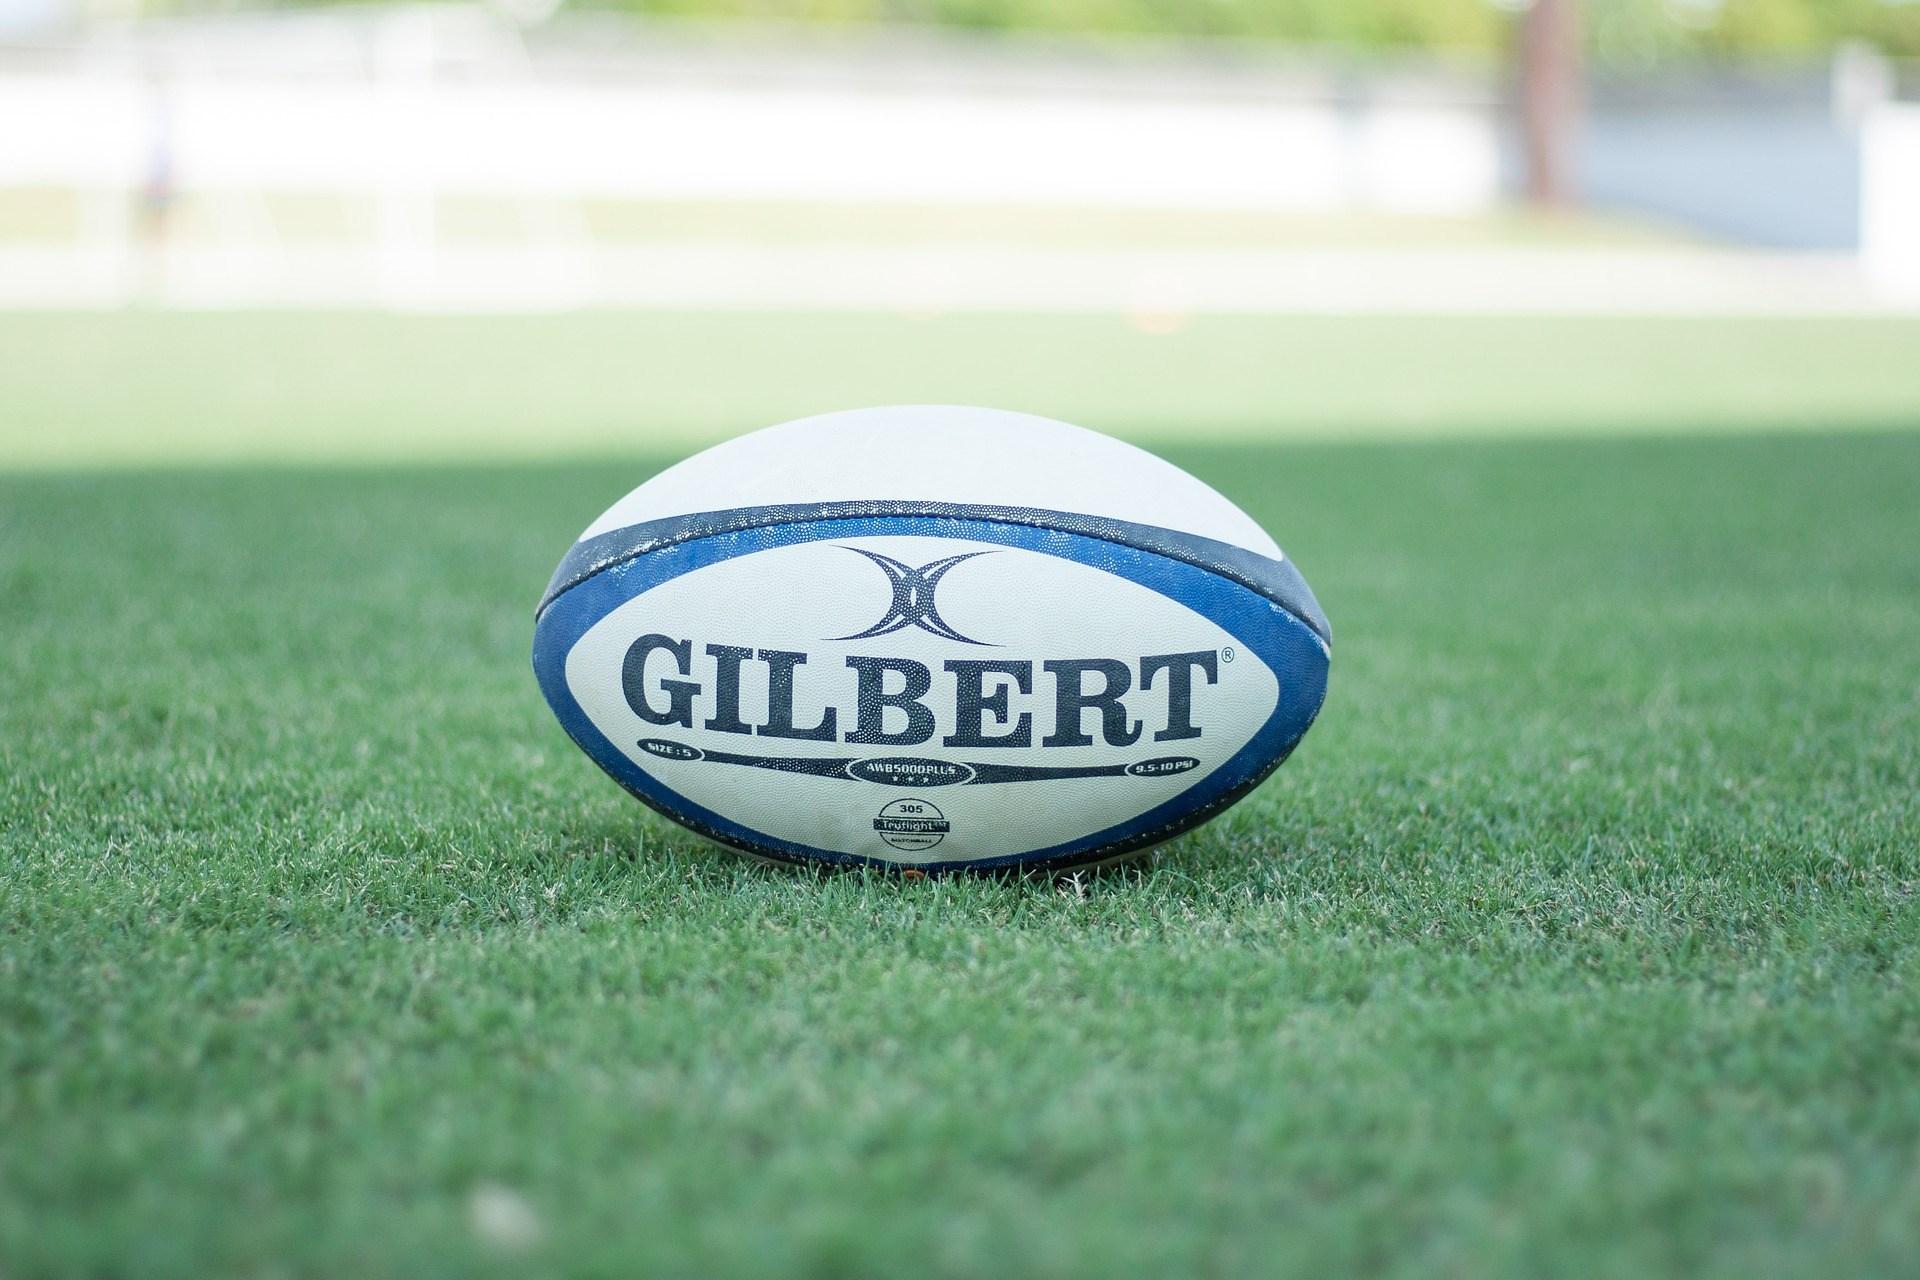 England v Ireland (Rugby Union - Six Nations)